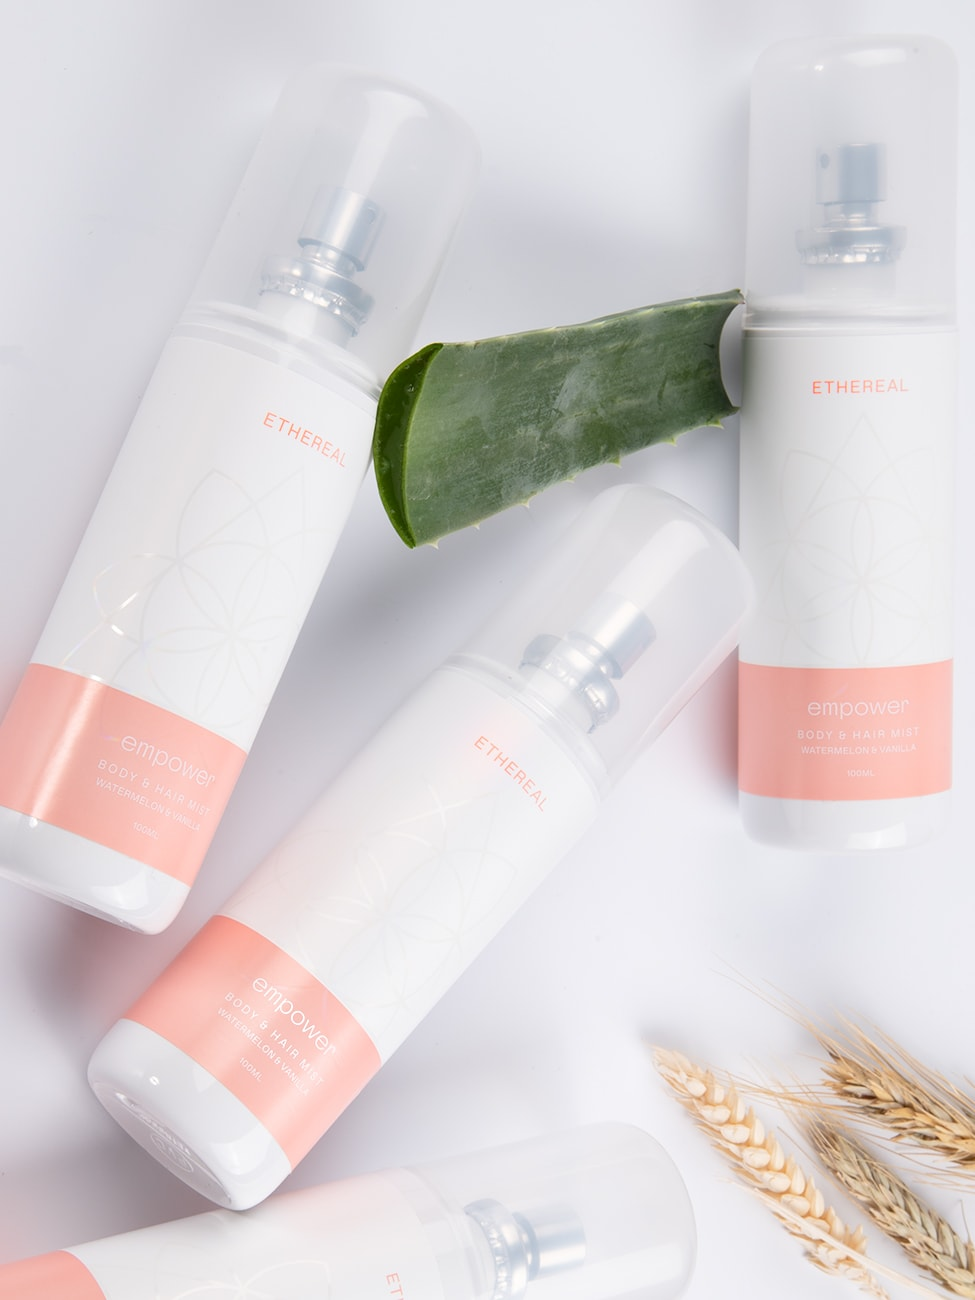 Empower_mist_comp_Ethereal_Dermocosmetics_Skincare_Handmade_Greek_Products